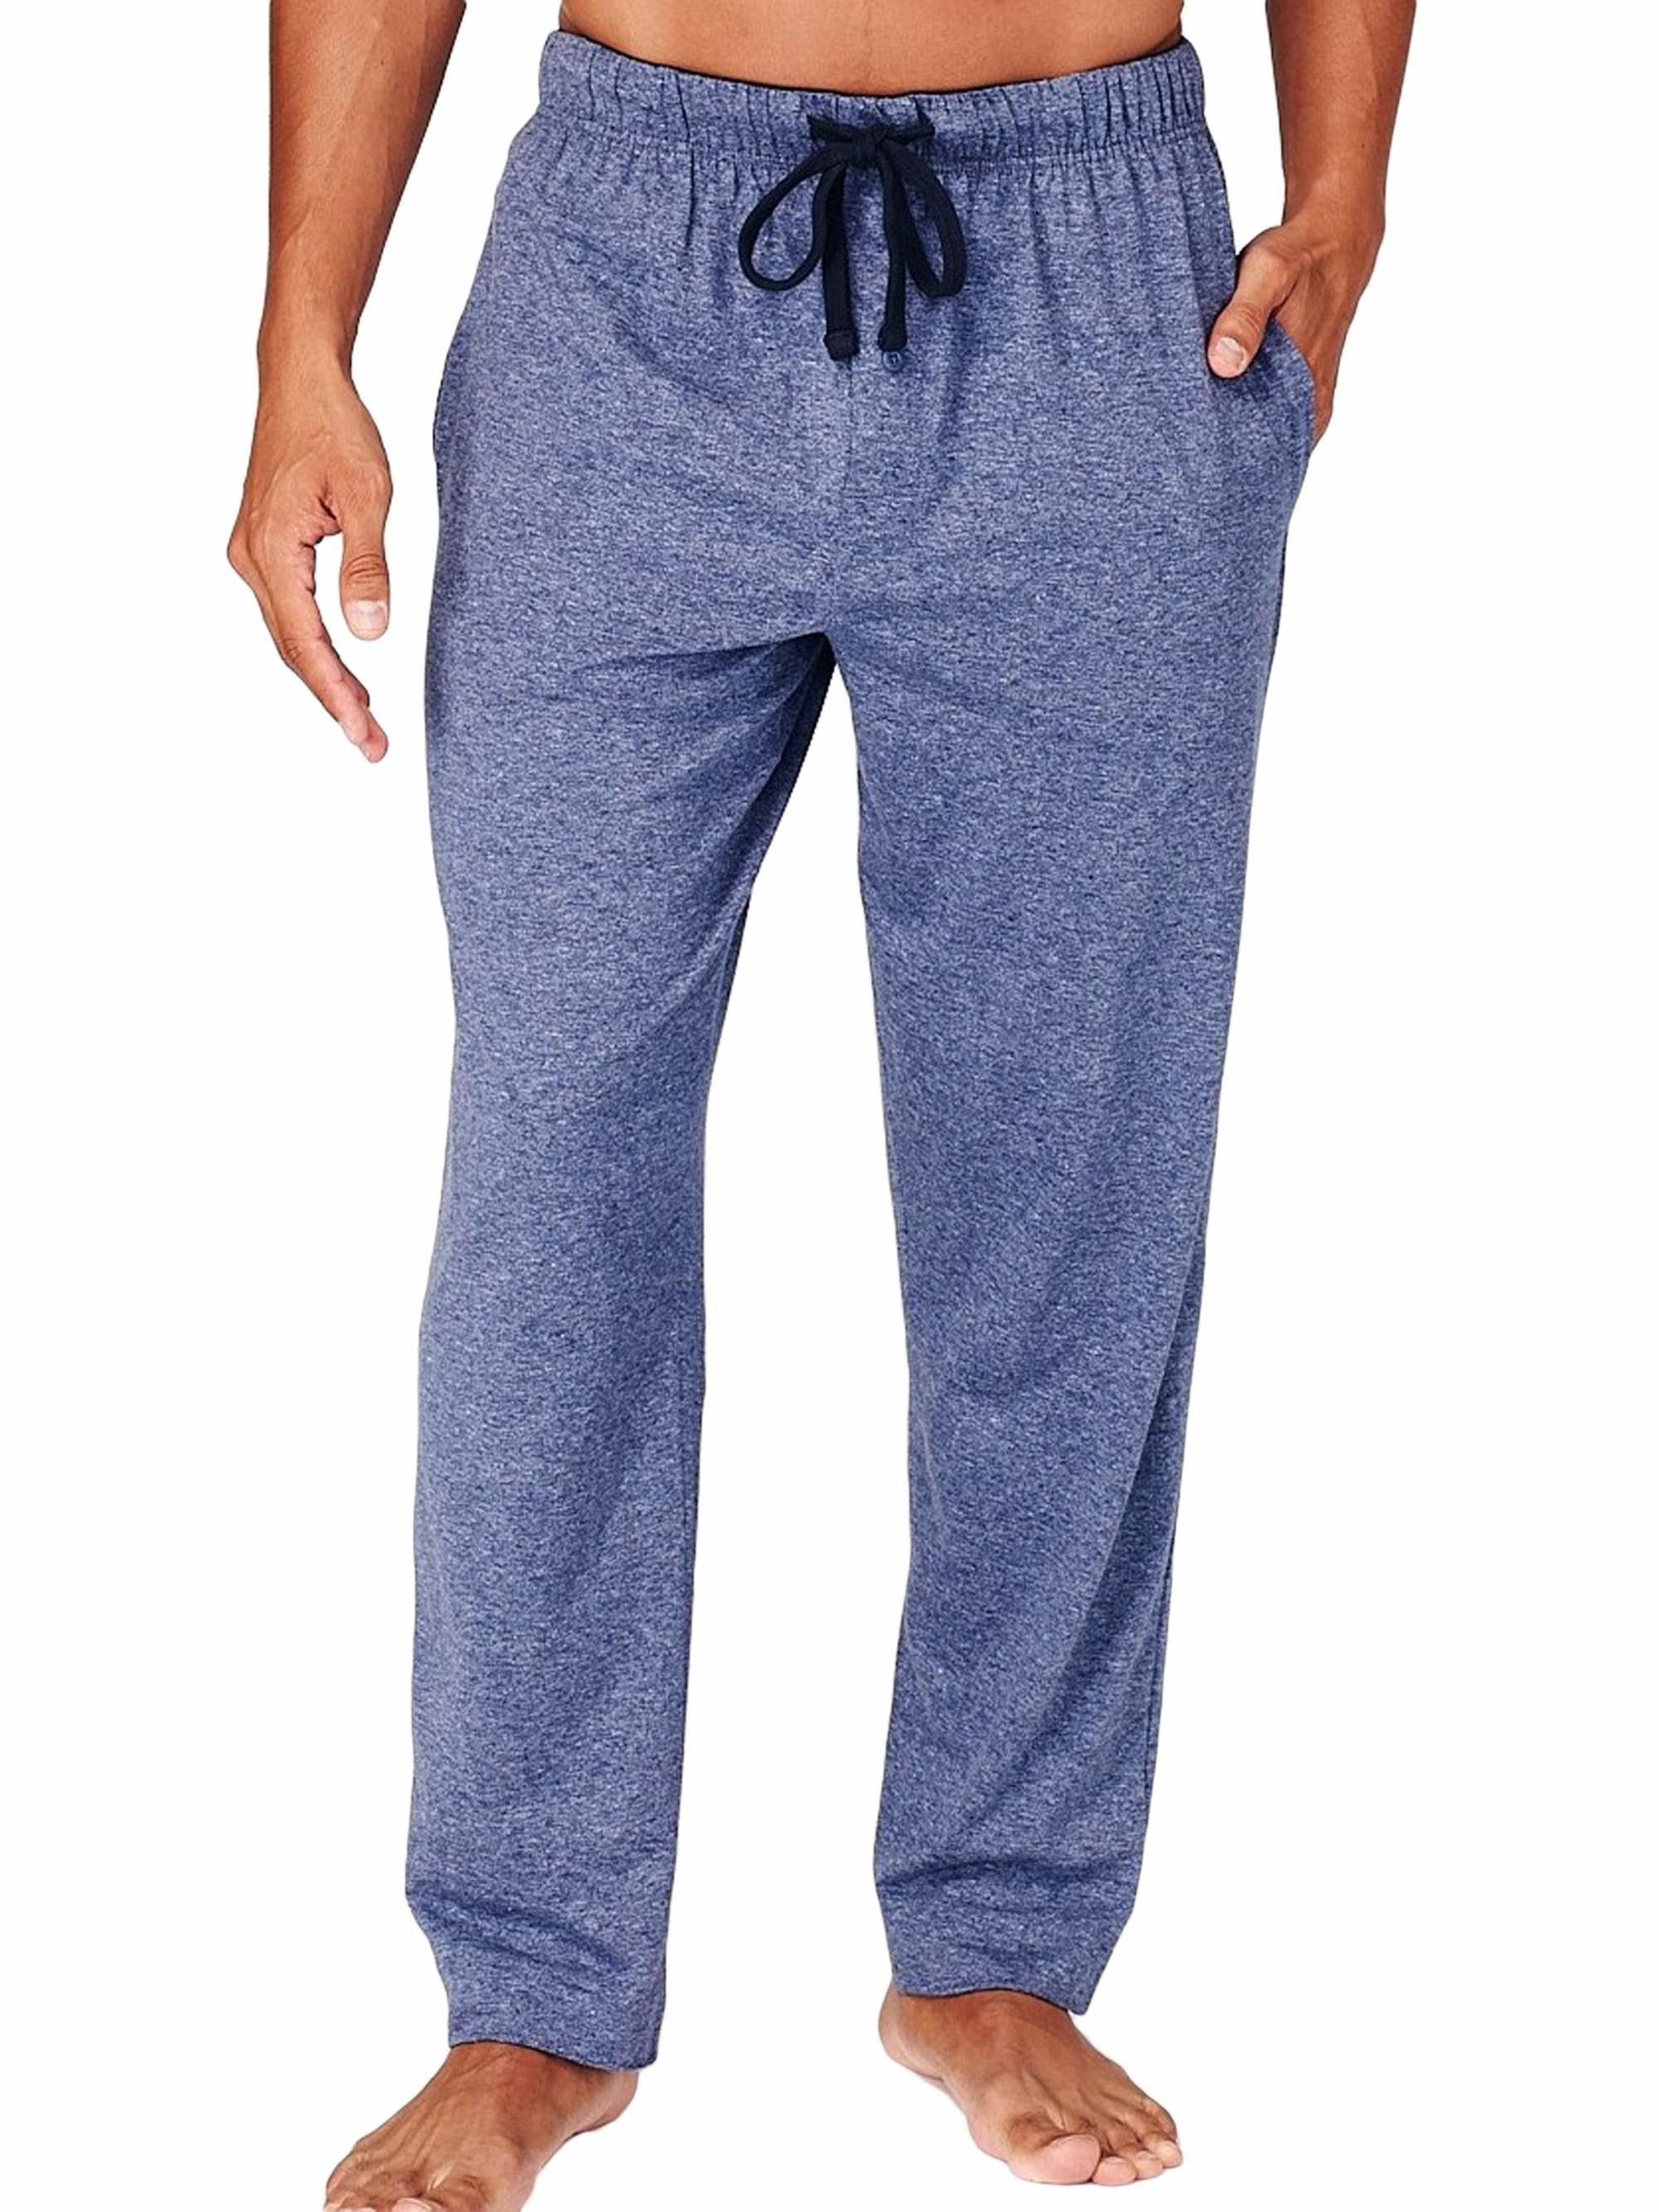 The light blue sweatpants